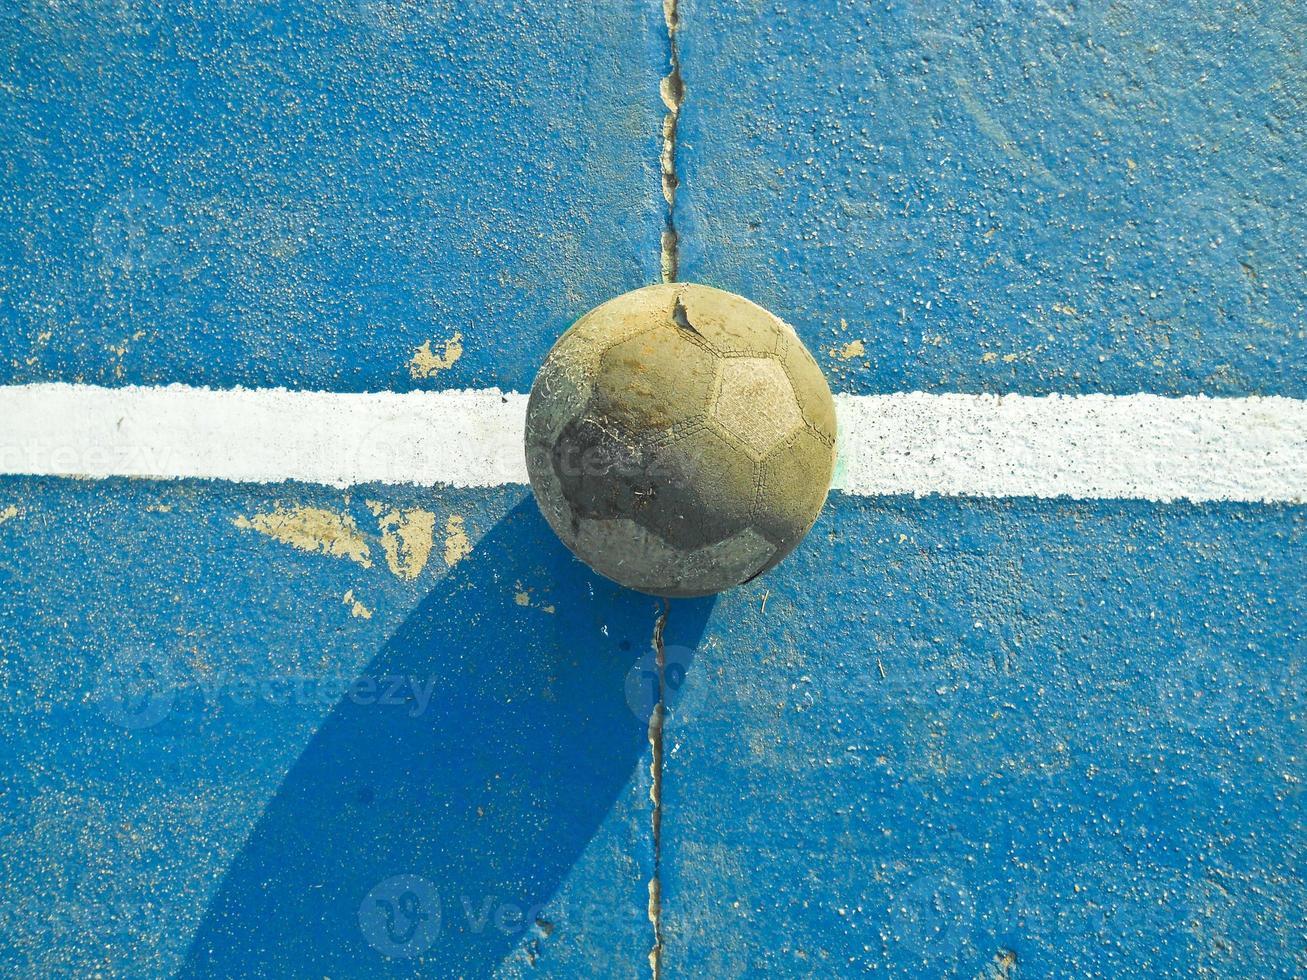 viejo balón de fútbol foto